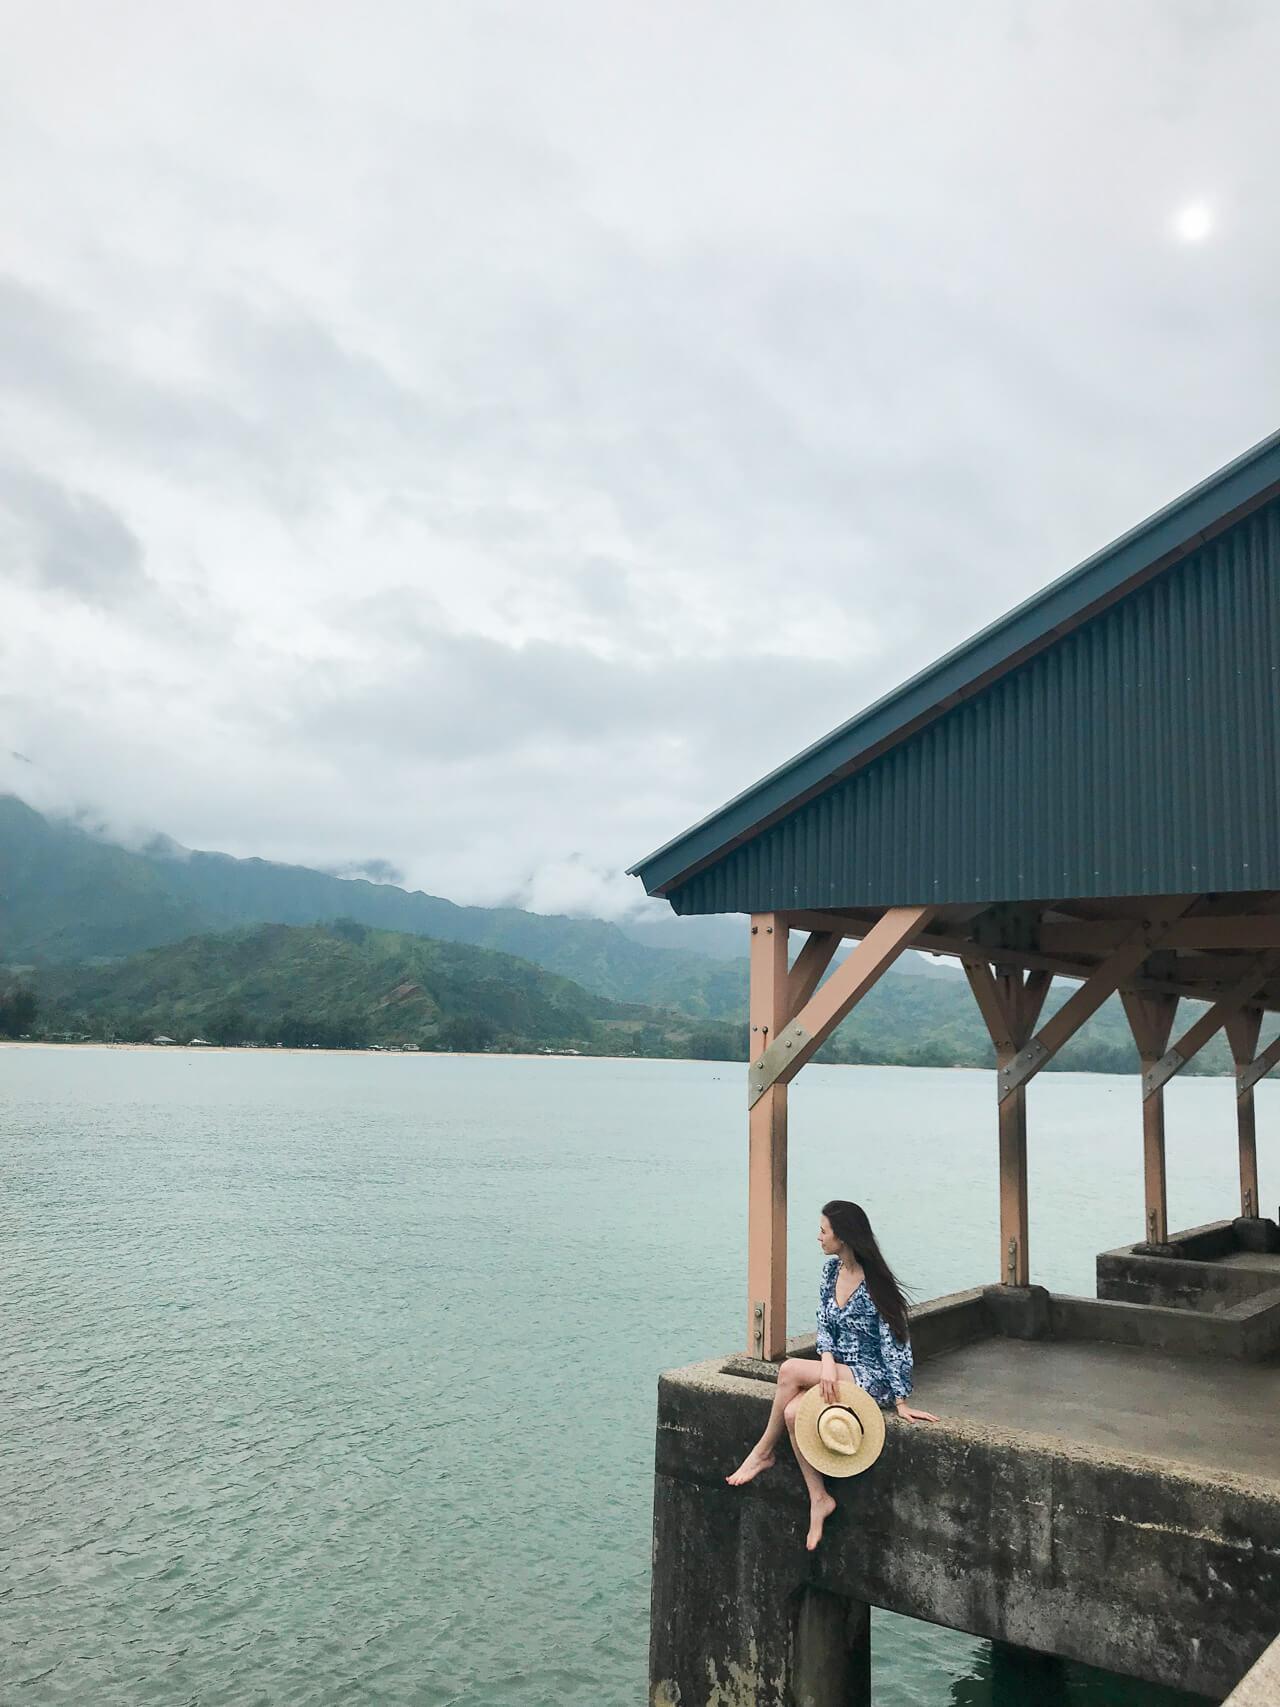 hanalei pier in kauai - M Loves M Kauai Travel Diary @marmar